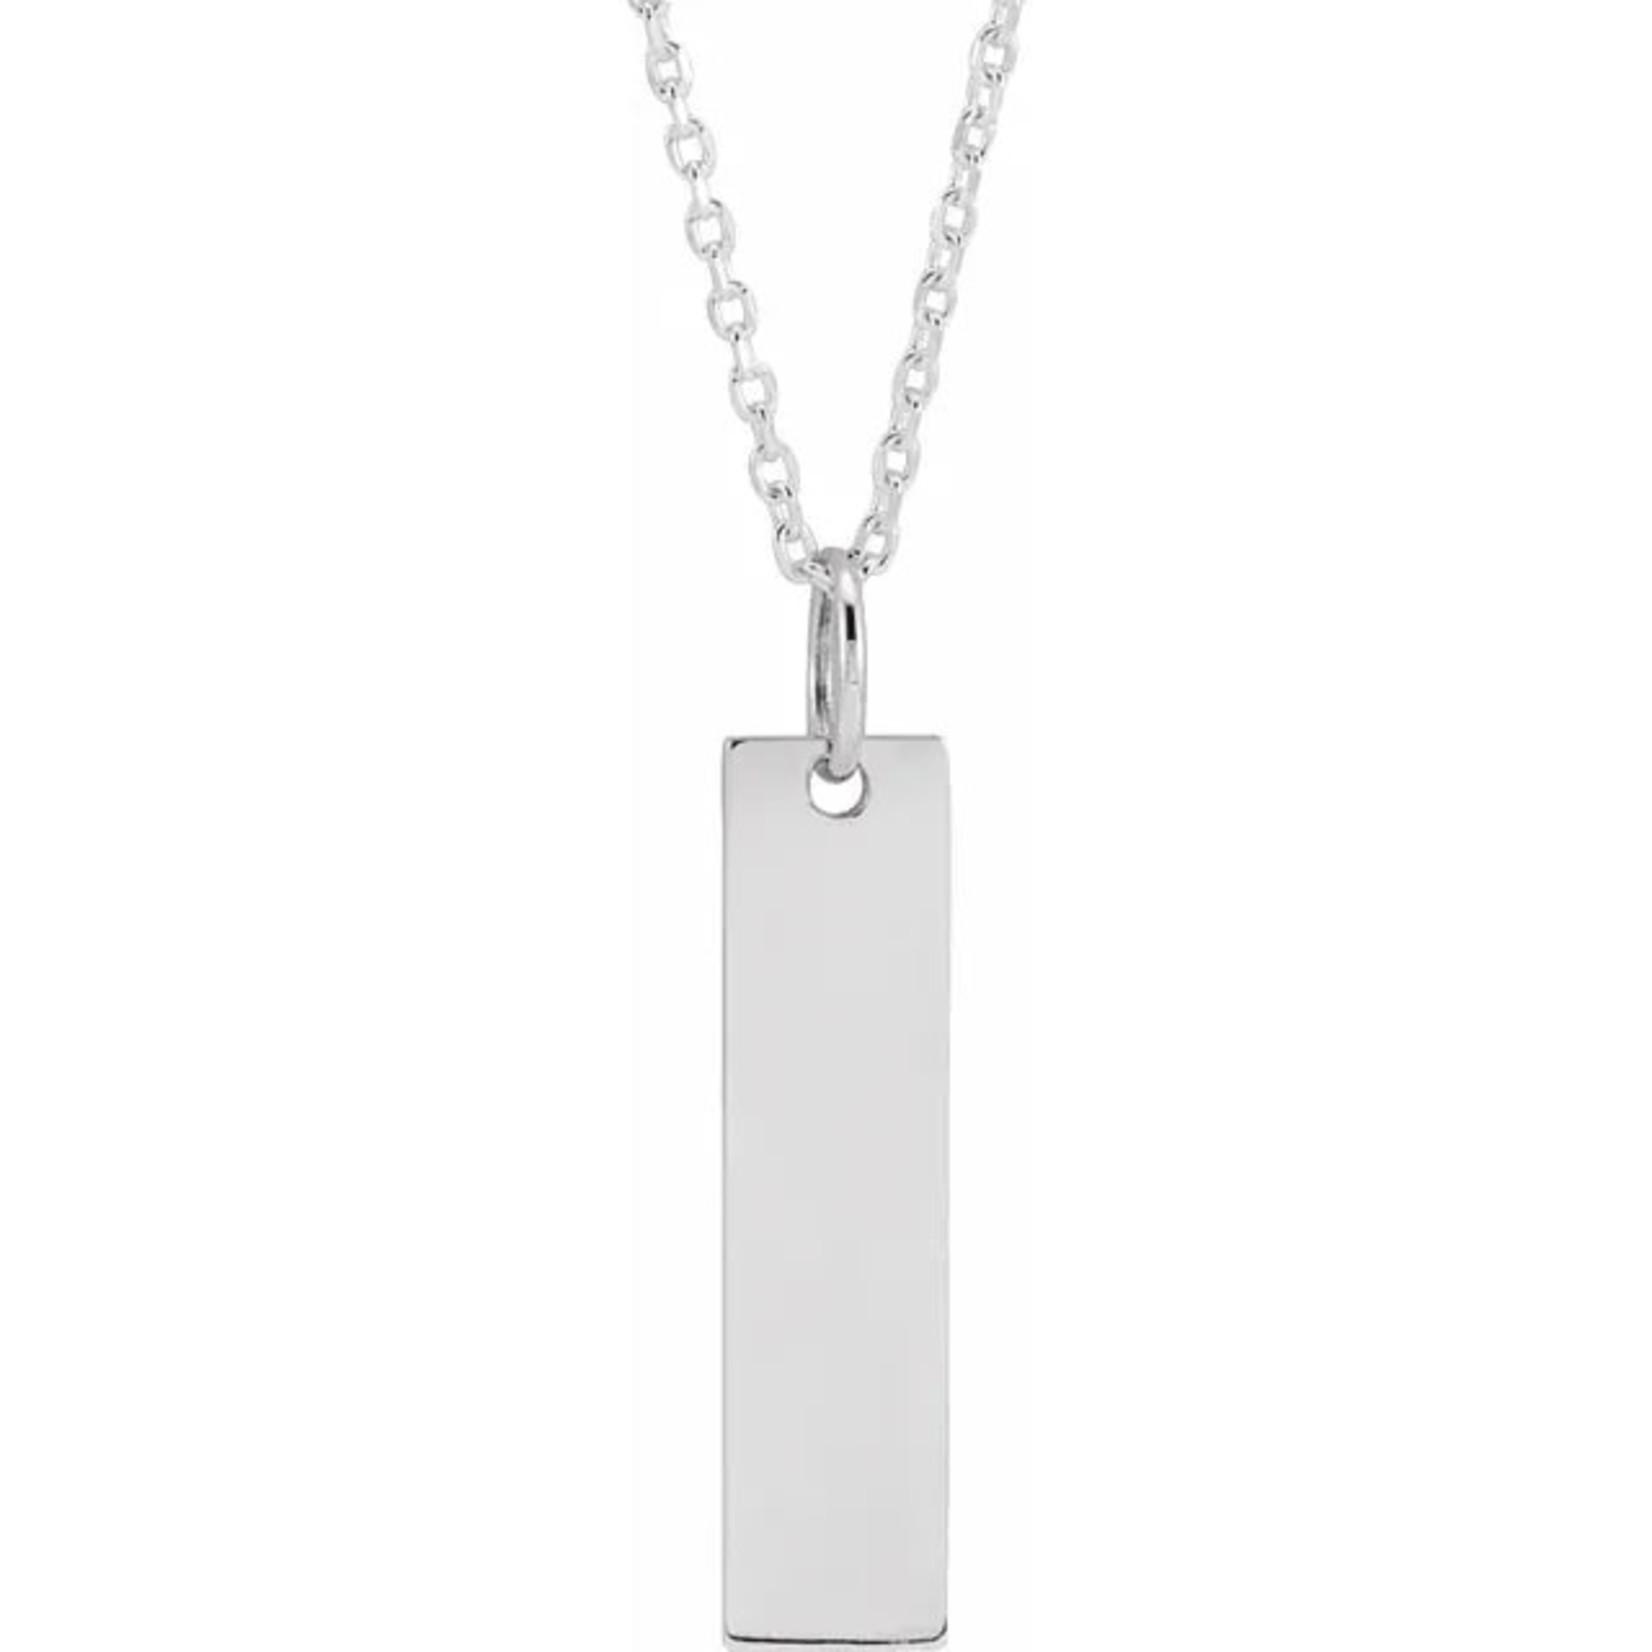 Sterling Silver Vertical Bar Necklace